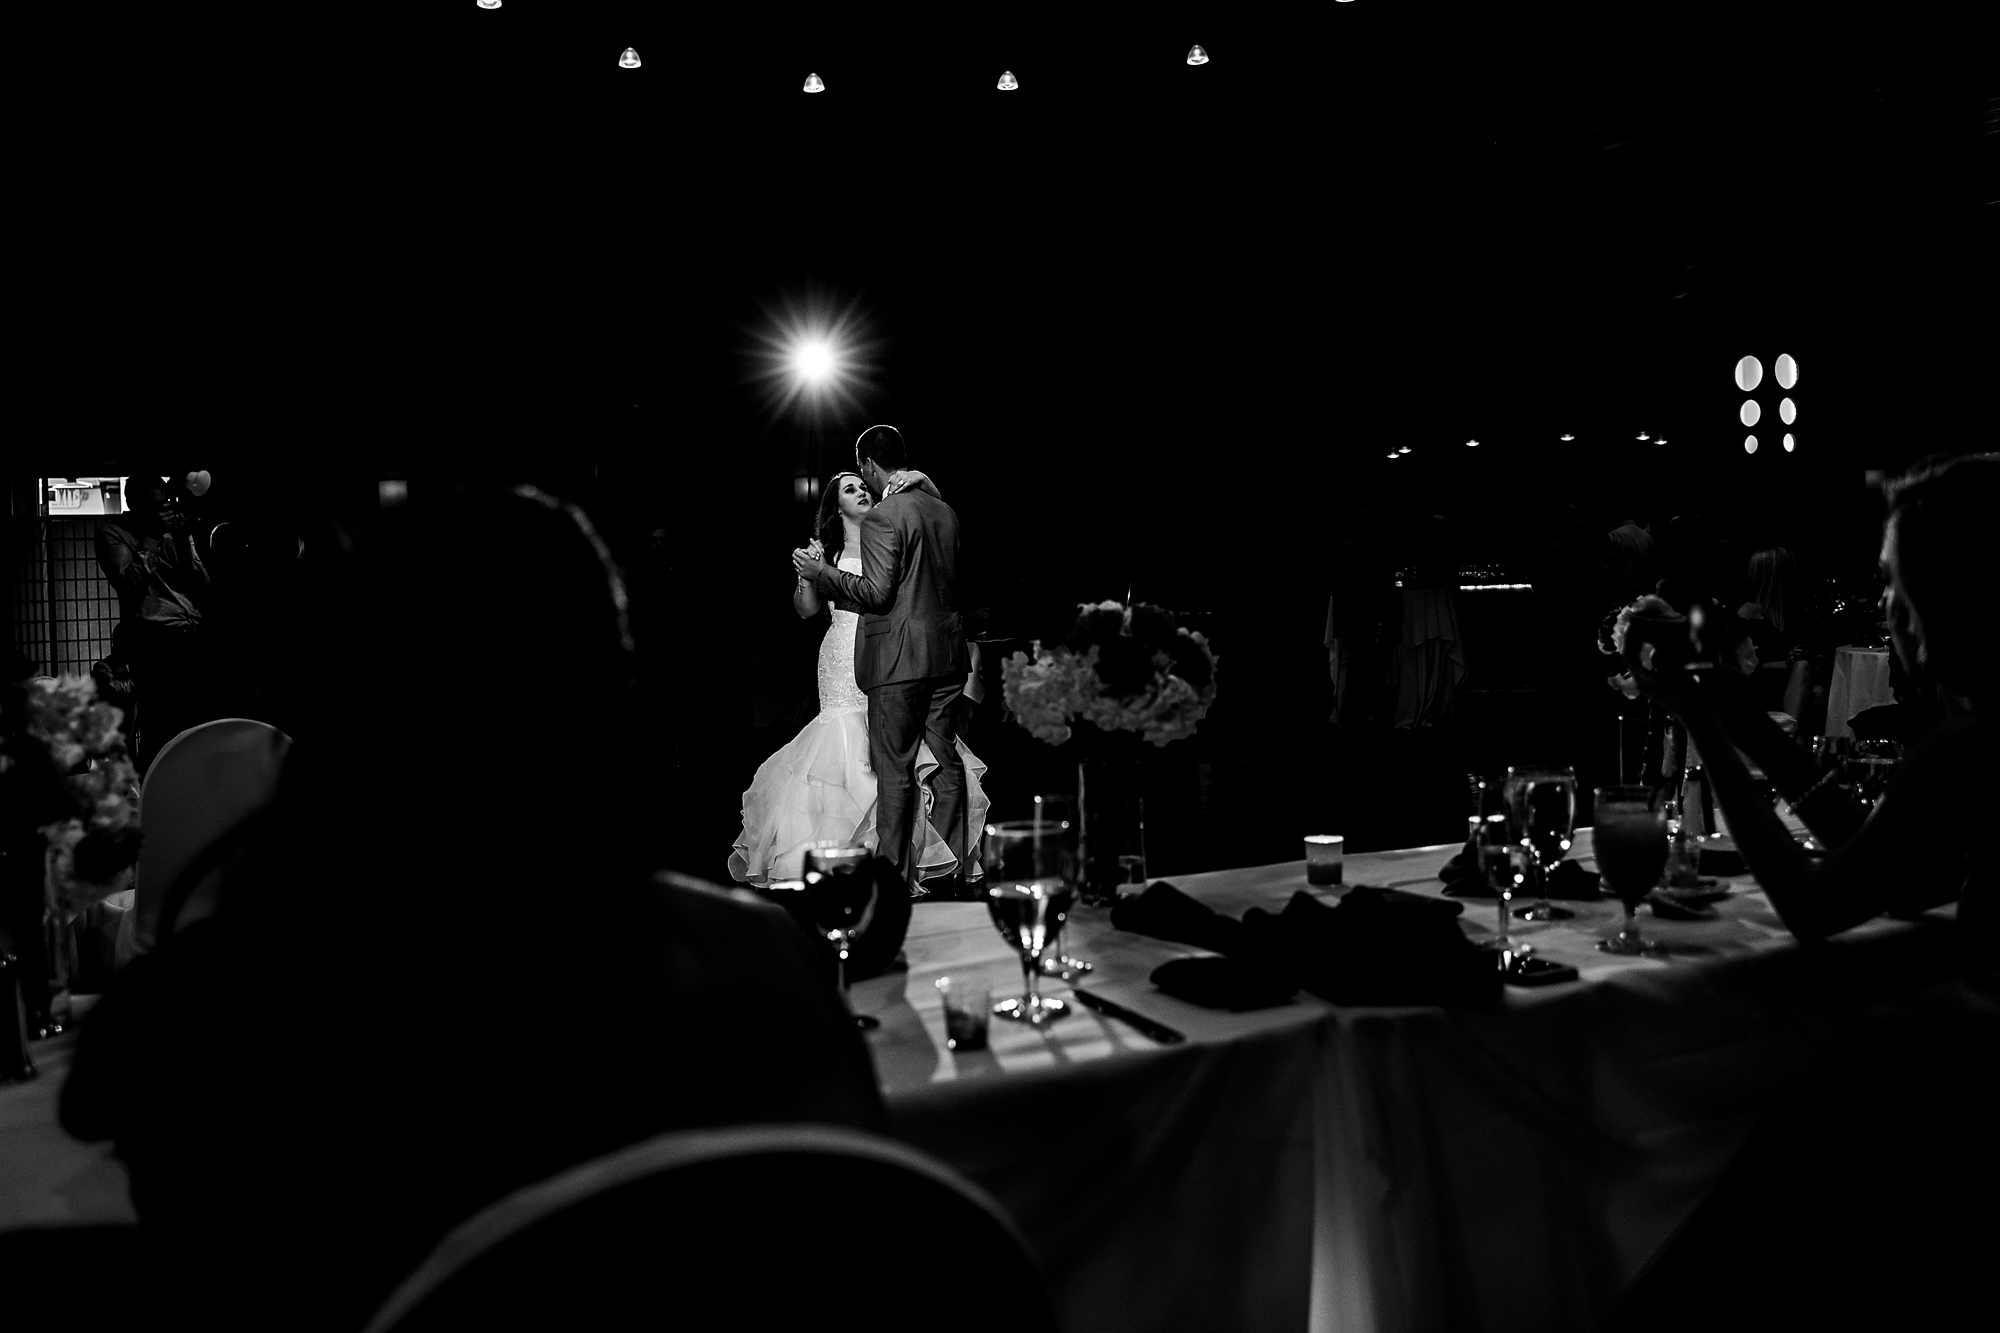 The-Pinnacle-Ballroom-Covington-KY-Wedding-Photography-17.jpg